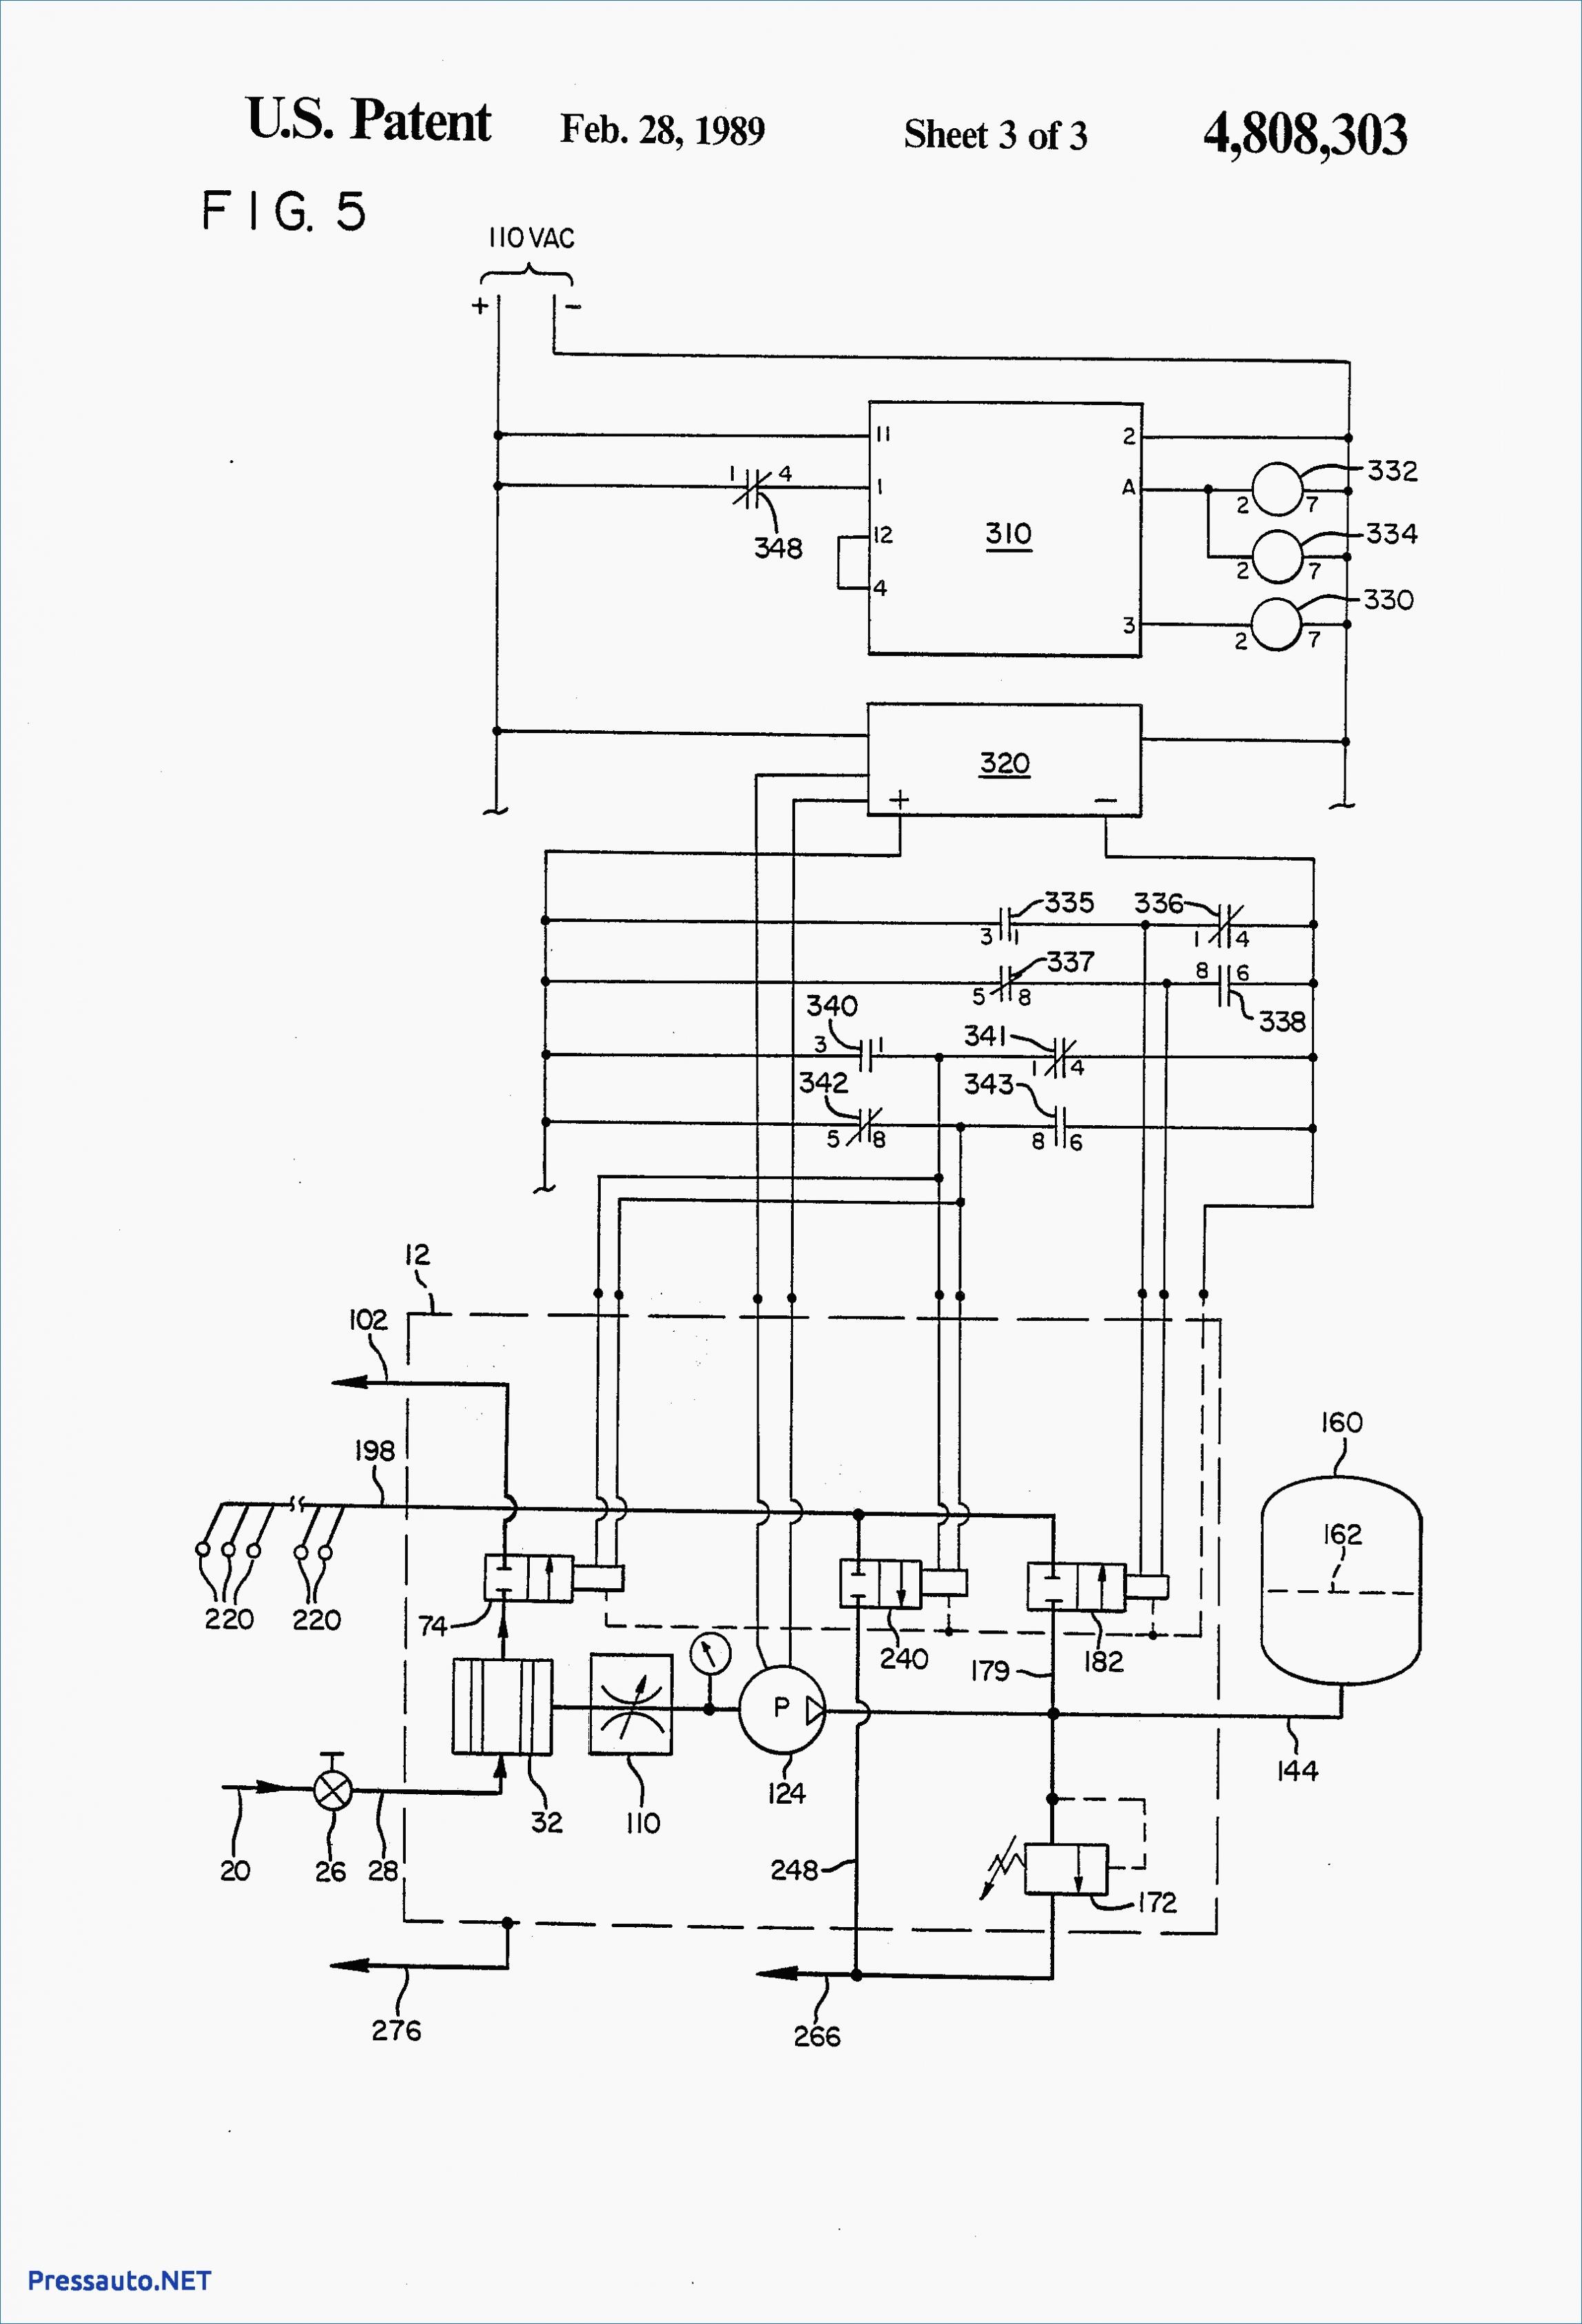 Hayward Super Pump Wiring Diagram Free Download | Wiring Library - Hayward Super Pump Wiring Diagram 115V